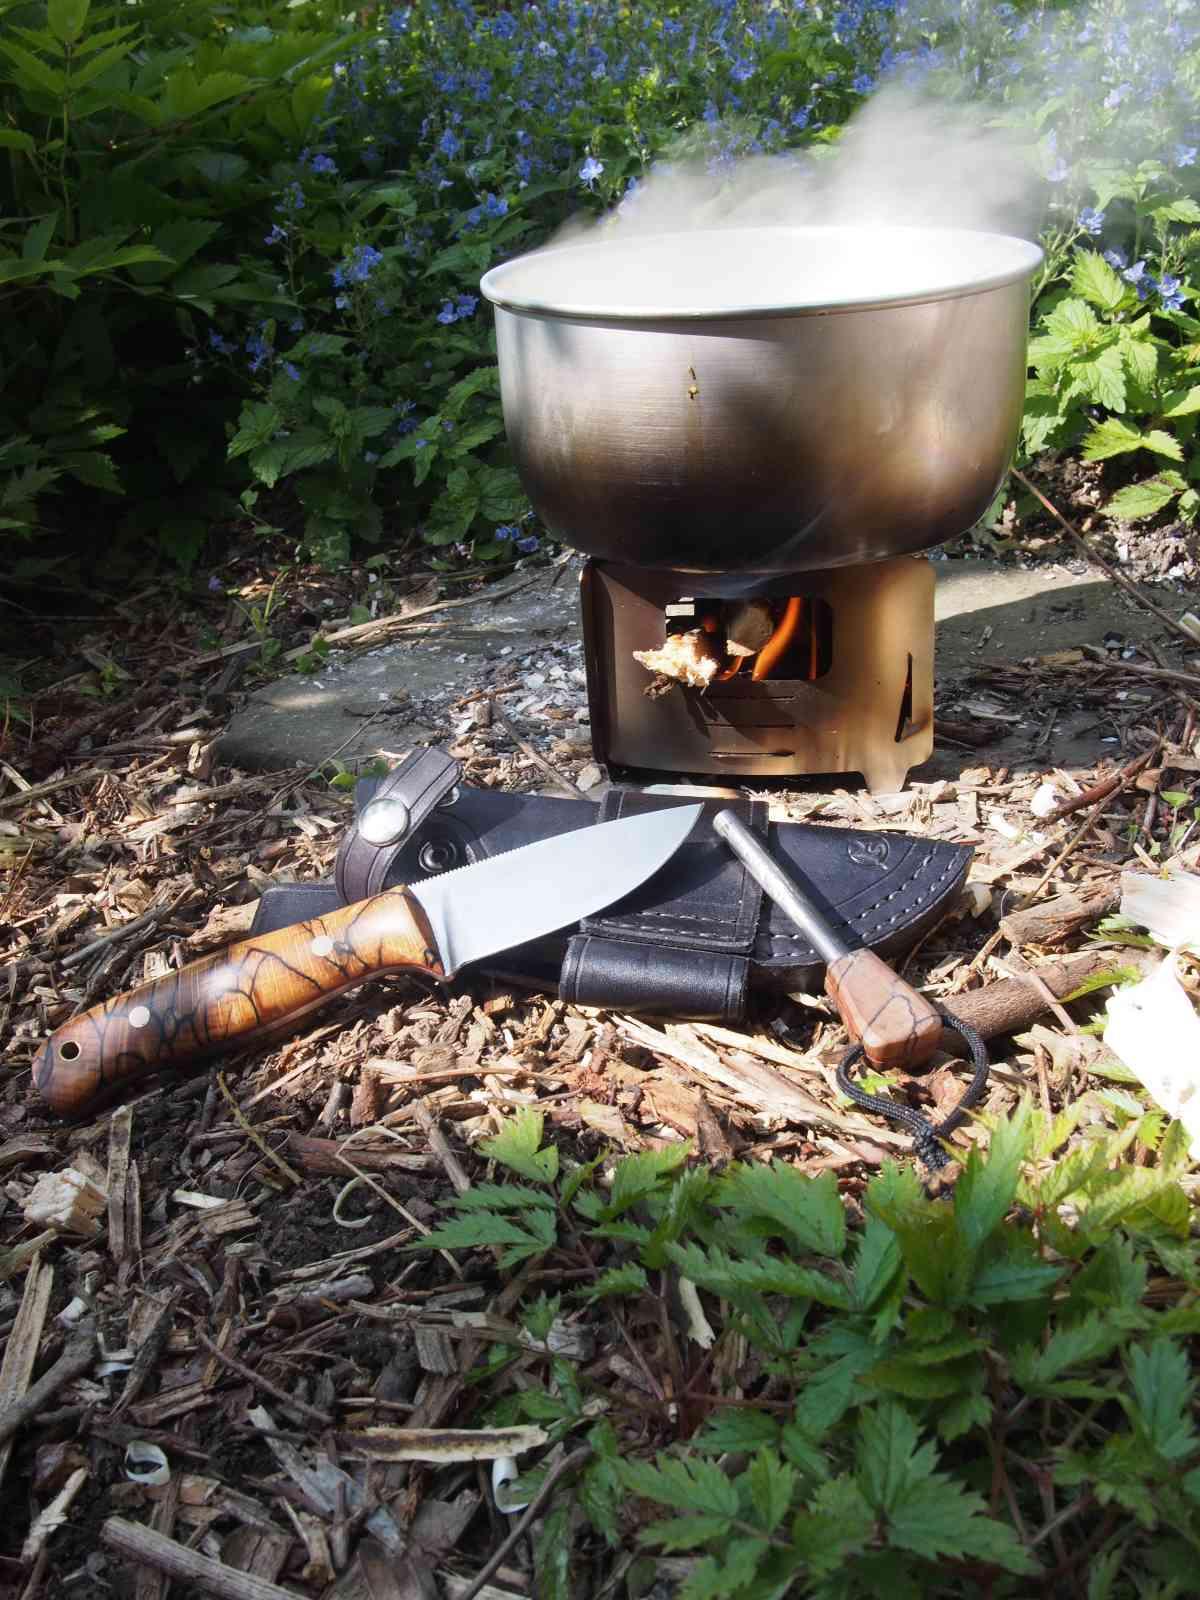 BorealisFIRE - Das Feuer brennt